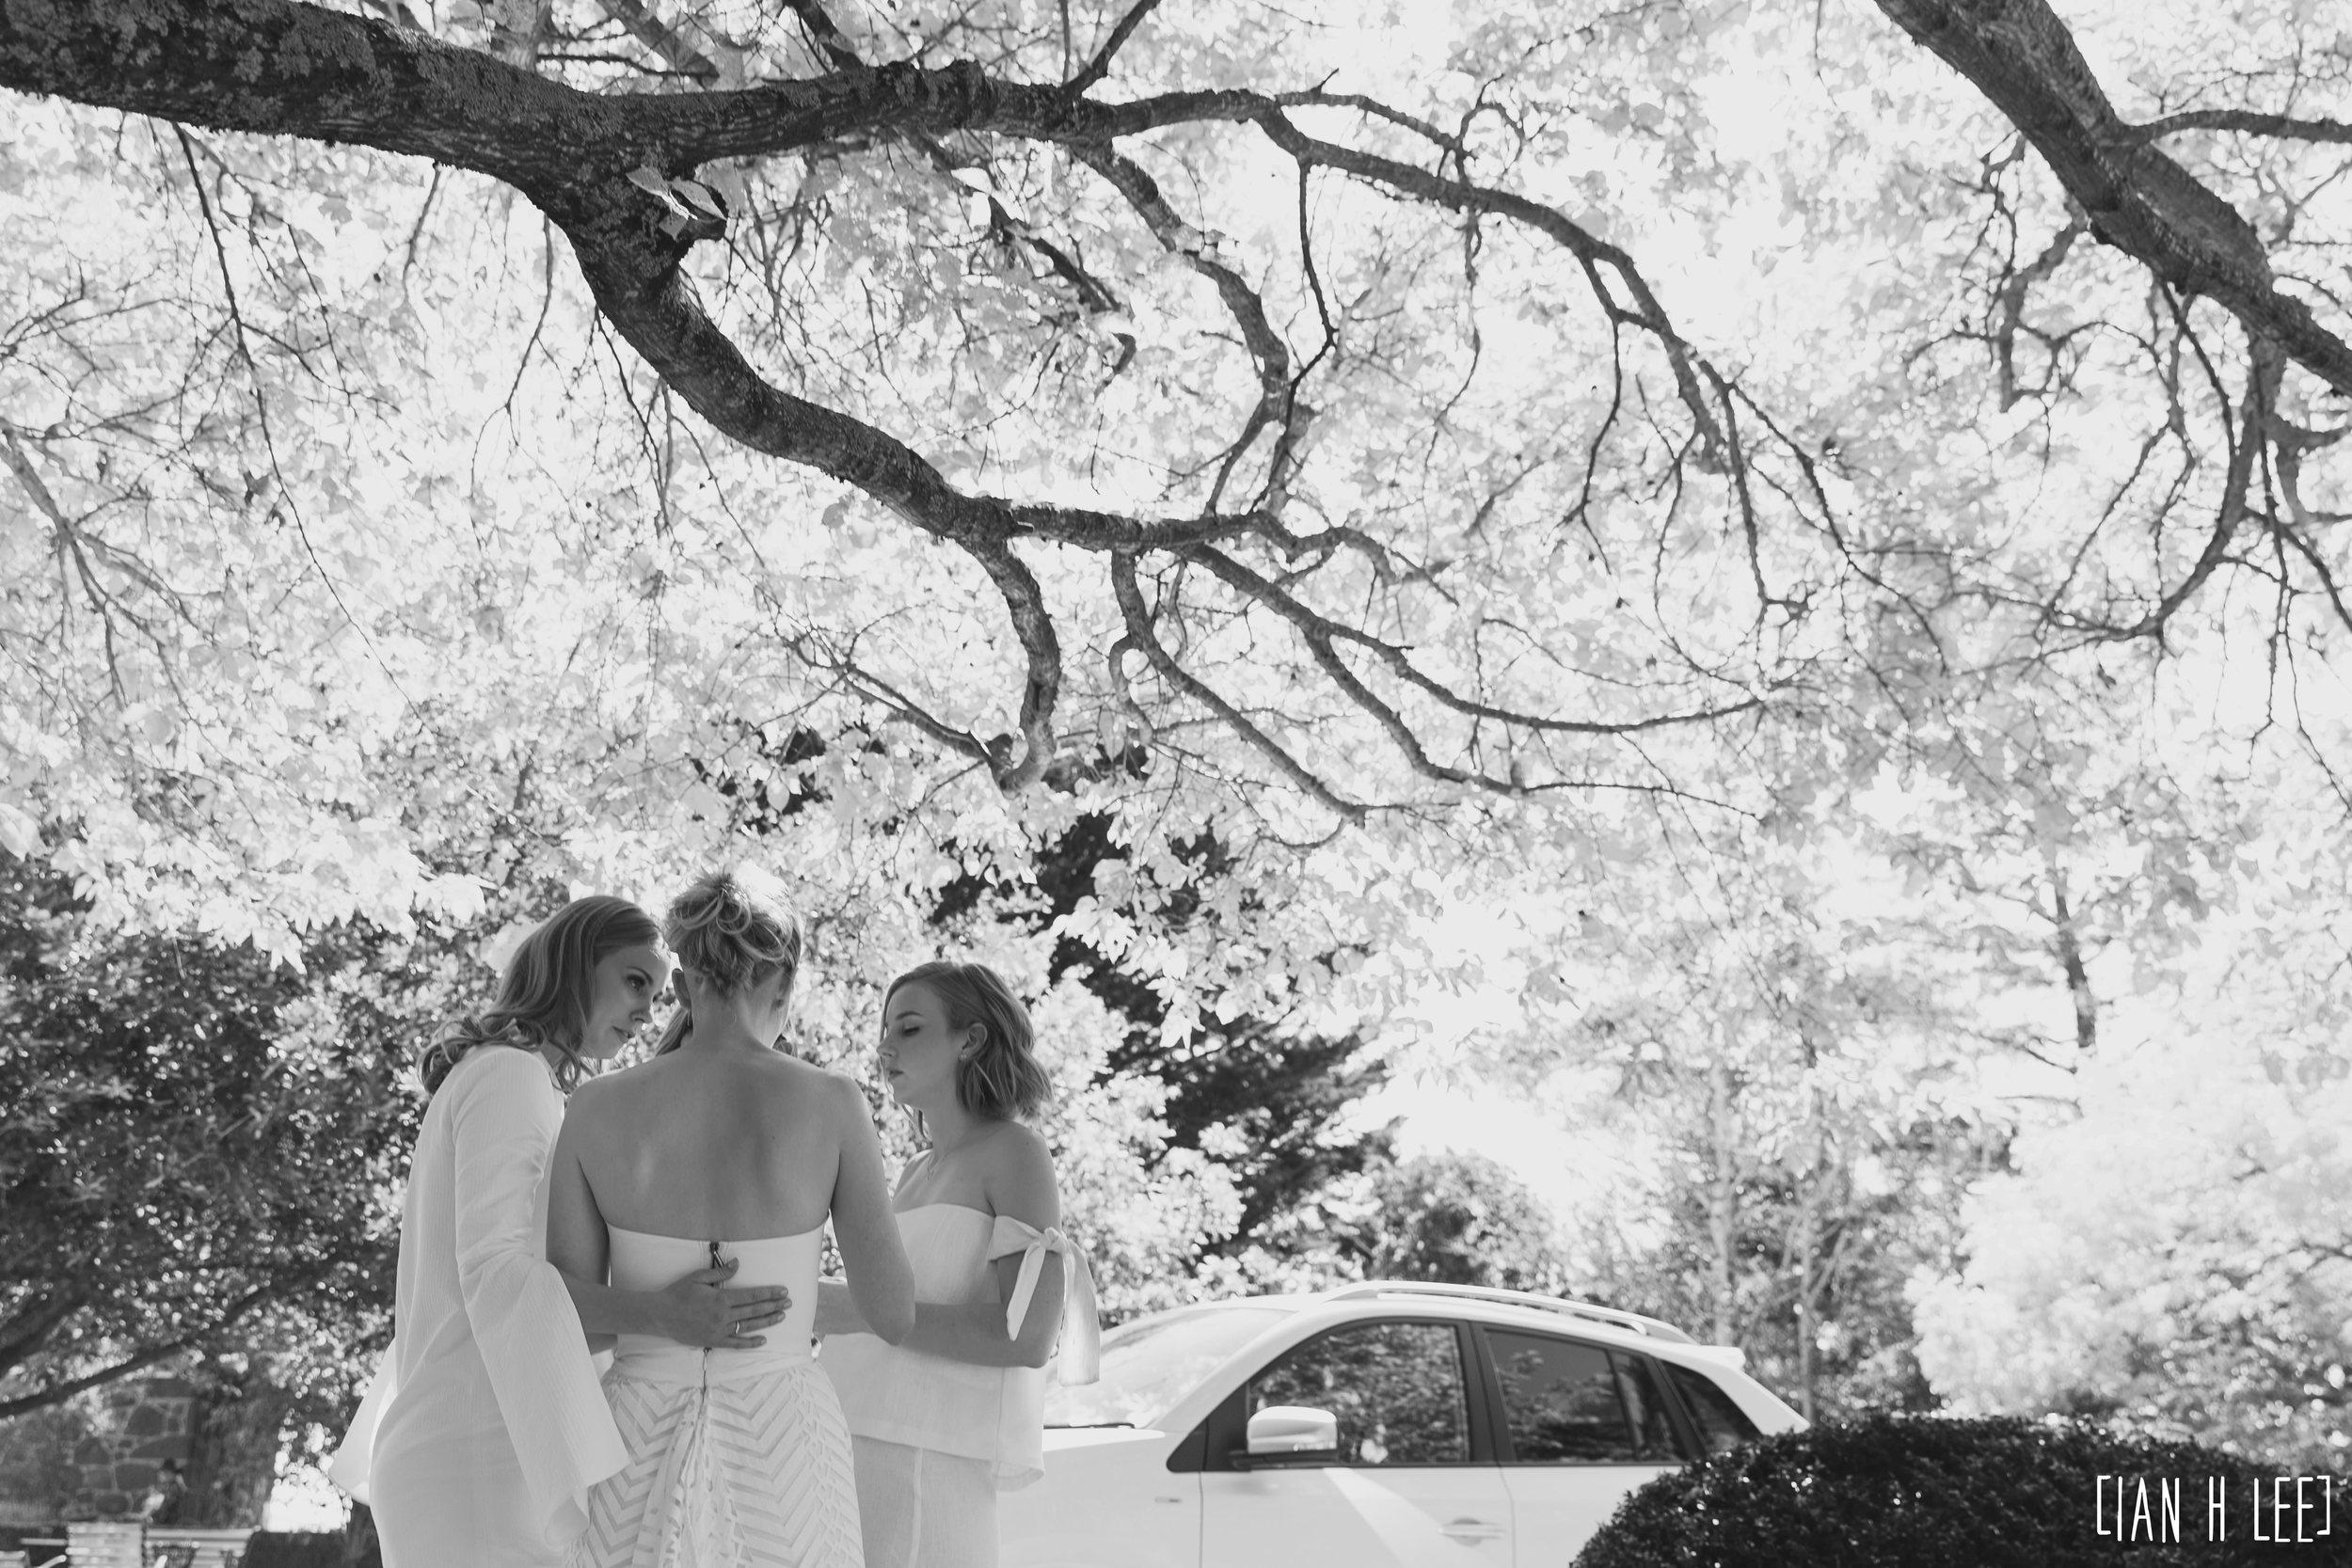 [Ian H Lee] Photography || Weddings - Melbourne || Ewan And Courtney -9337.jpg